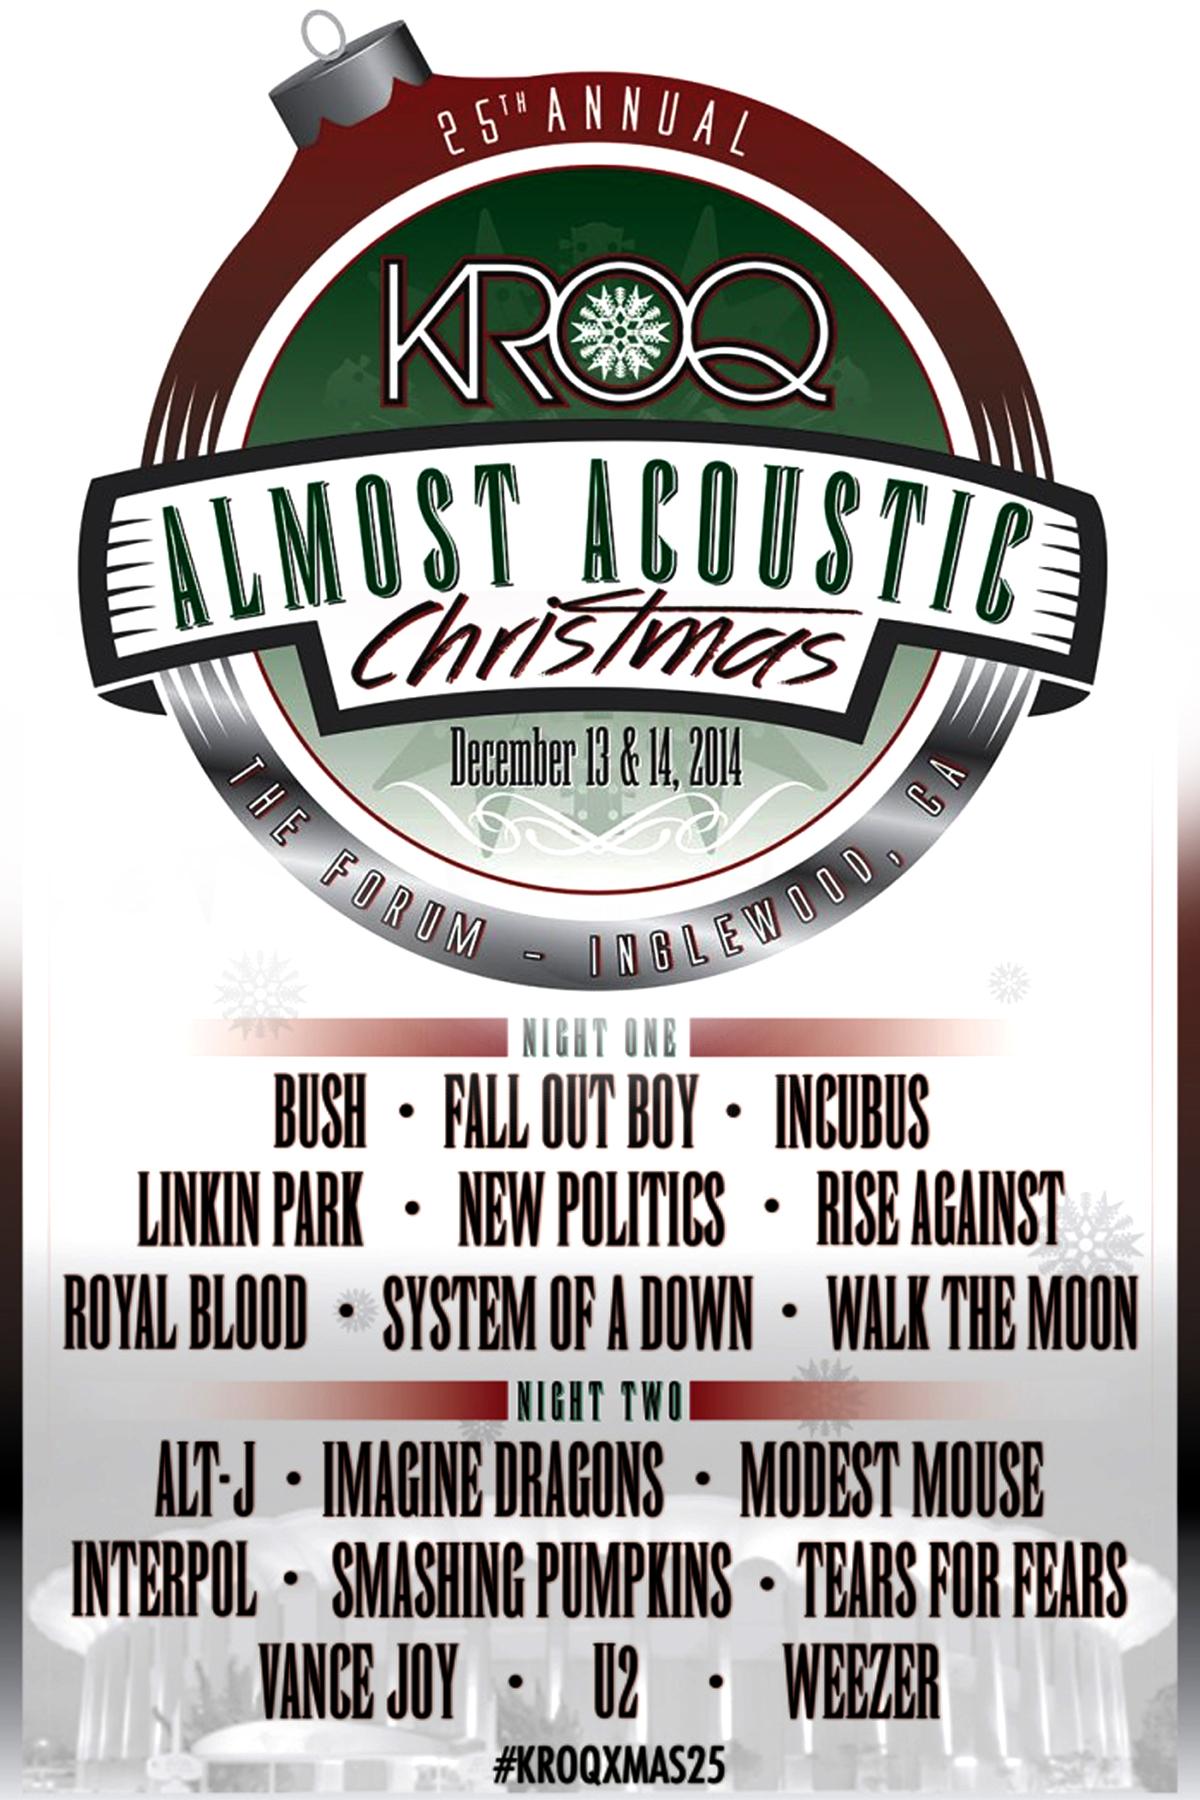 kroq almost acoustic christmas 2014 - Kroq Christmas